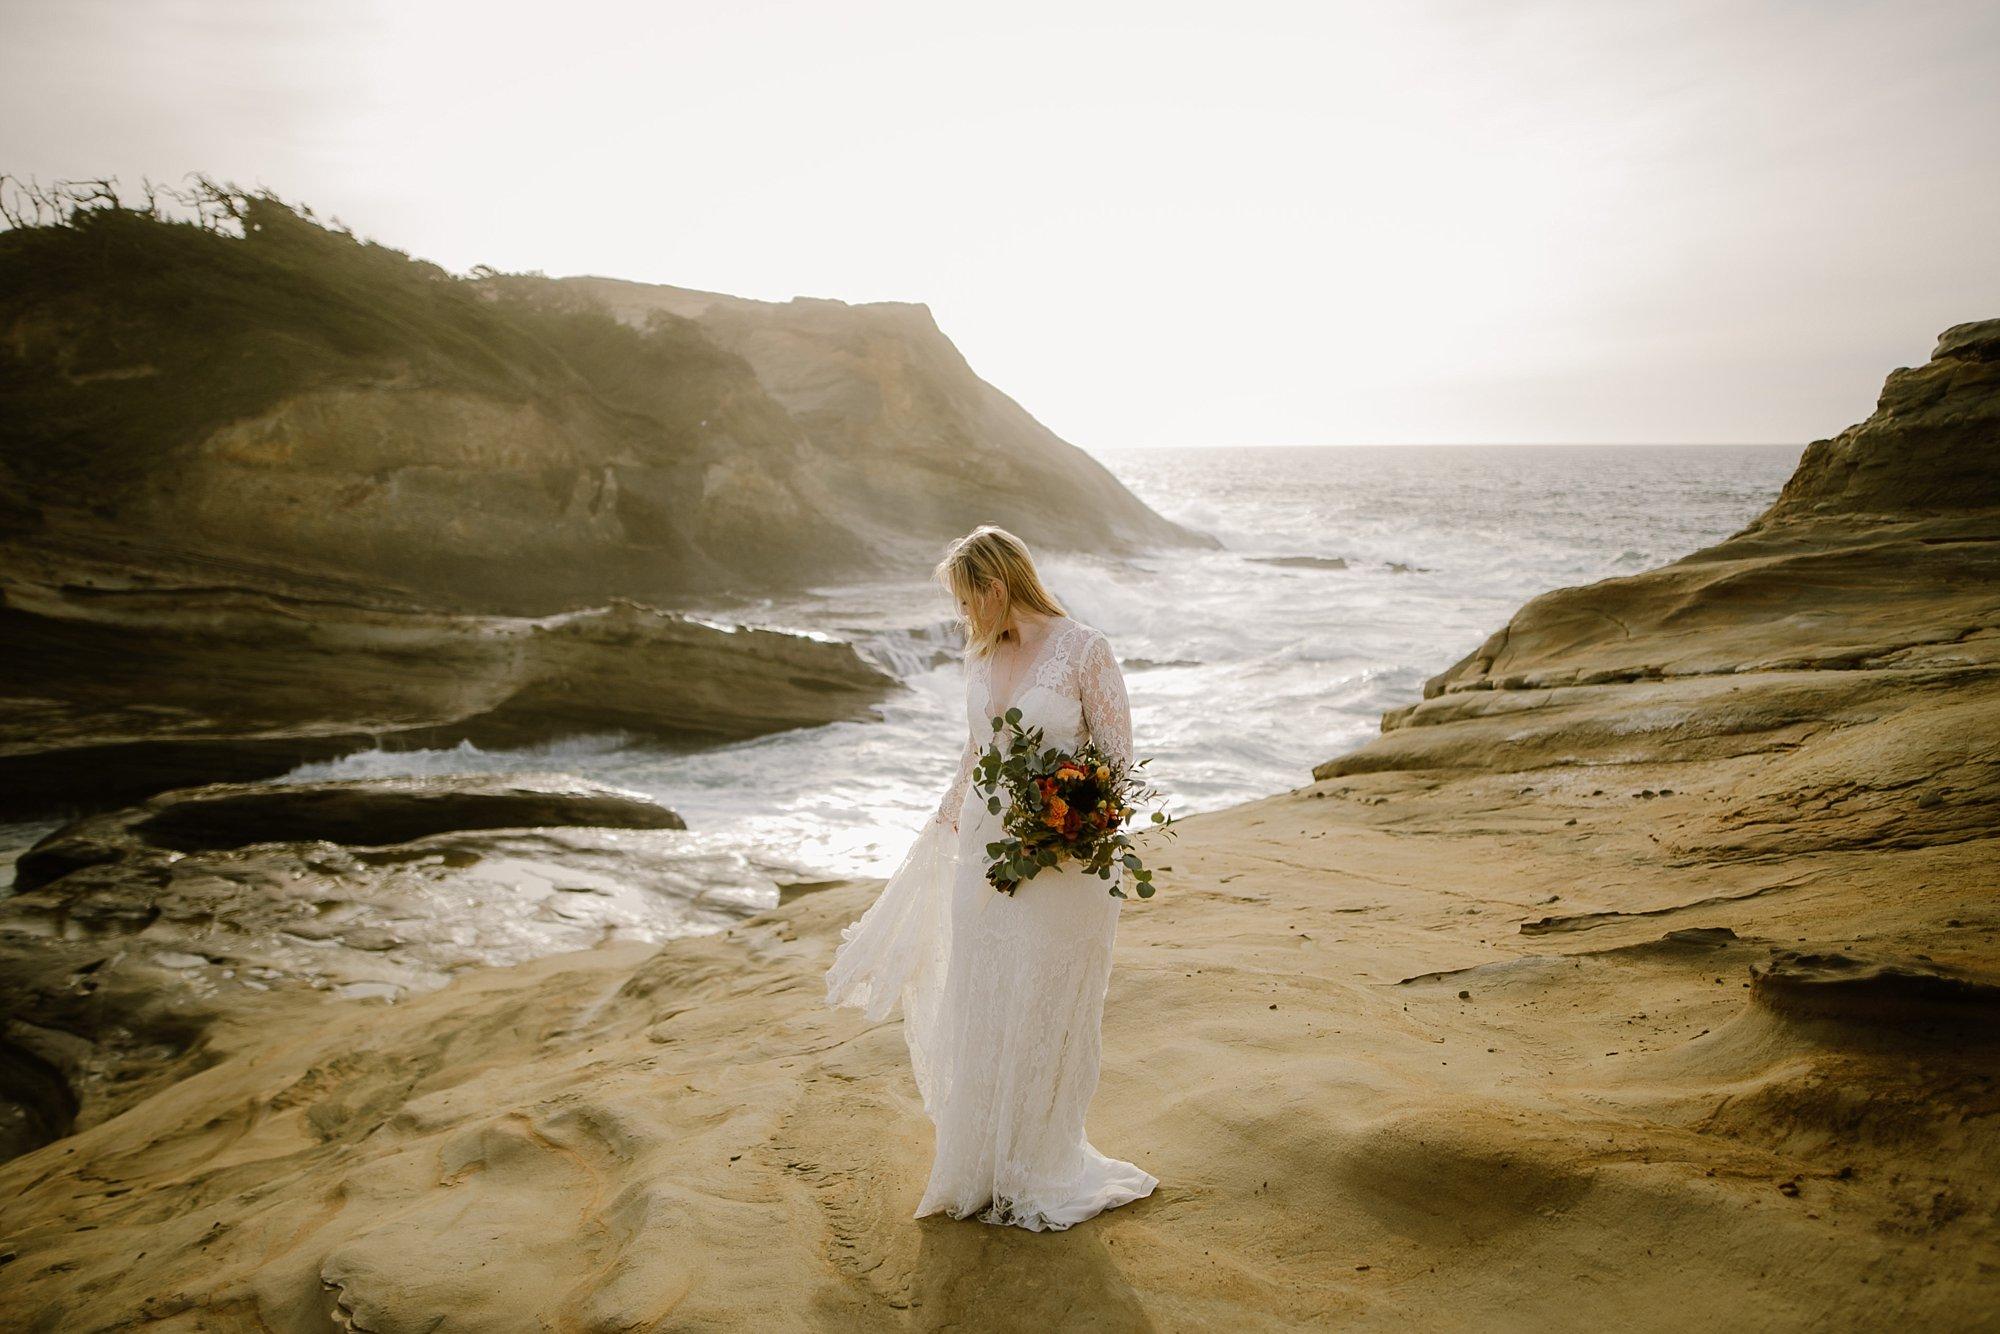 cape-kiwanda-elopement-wedding_0011.jpg